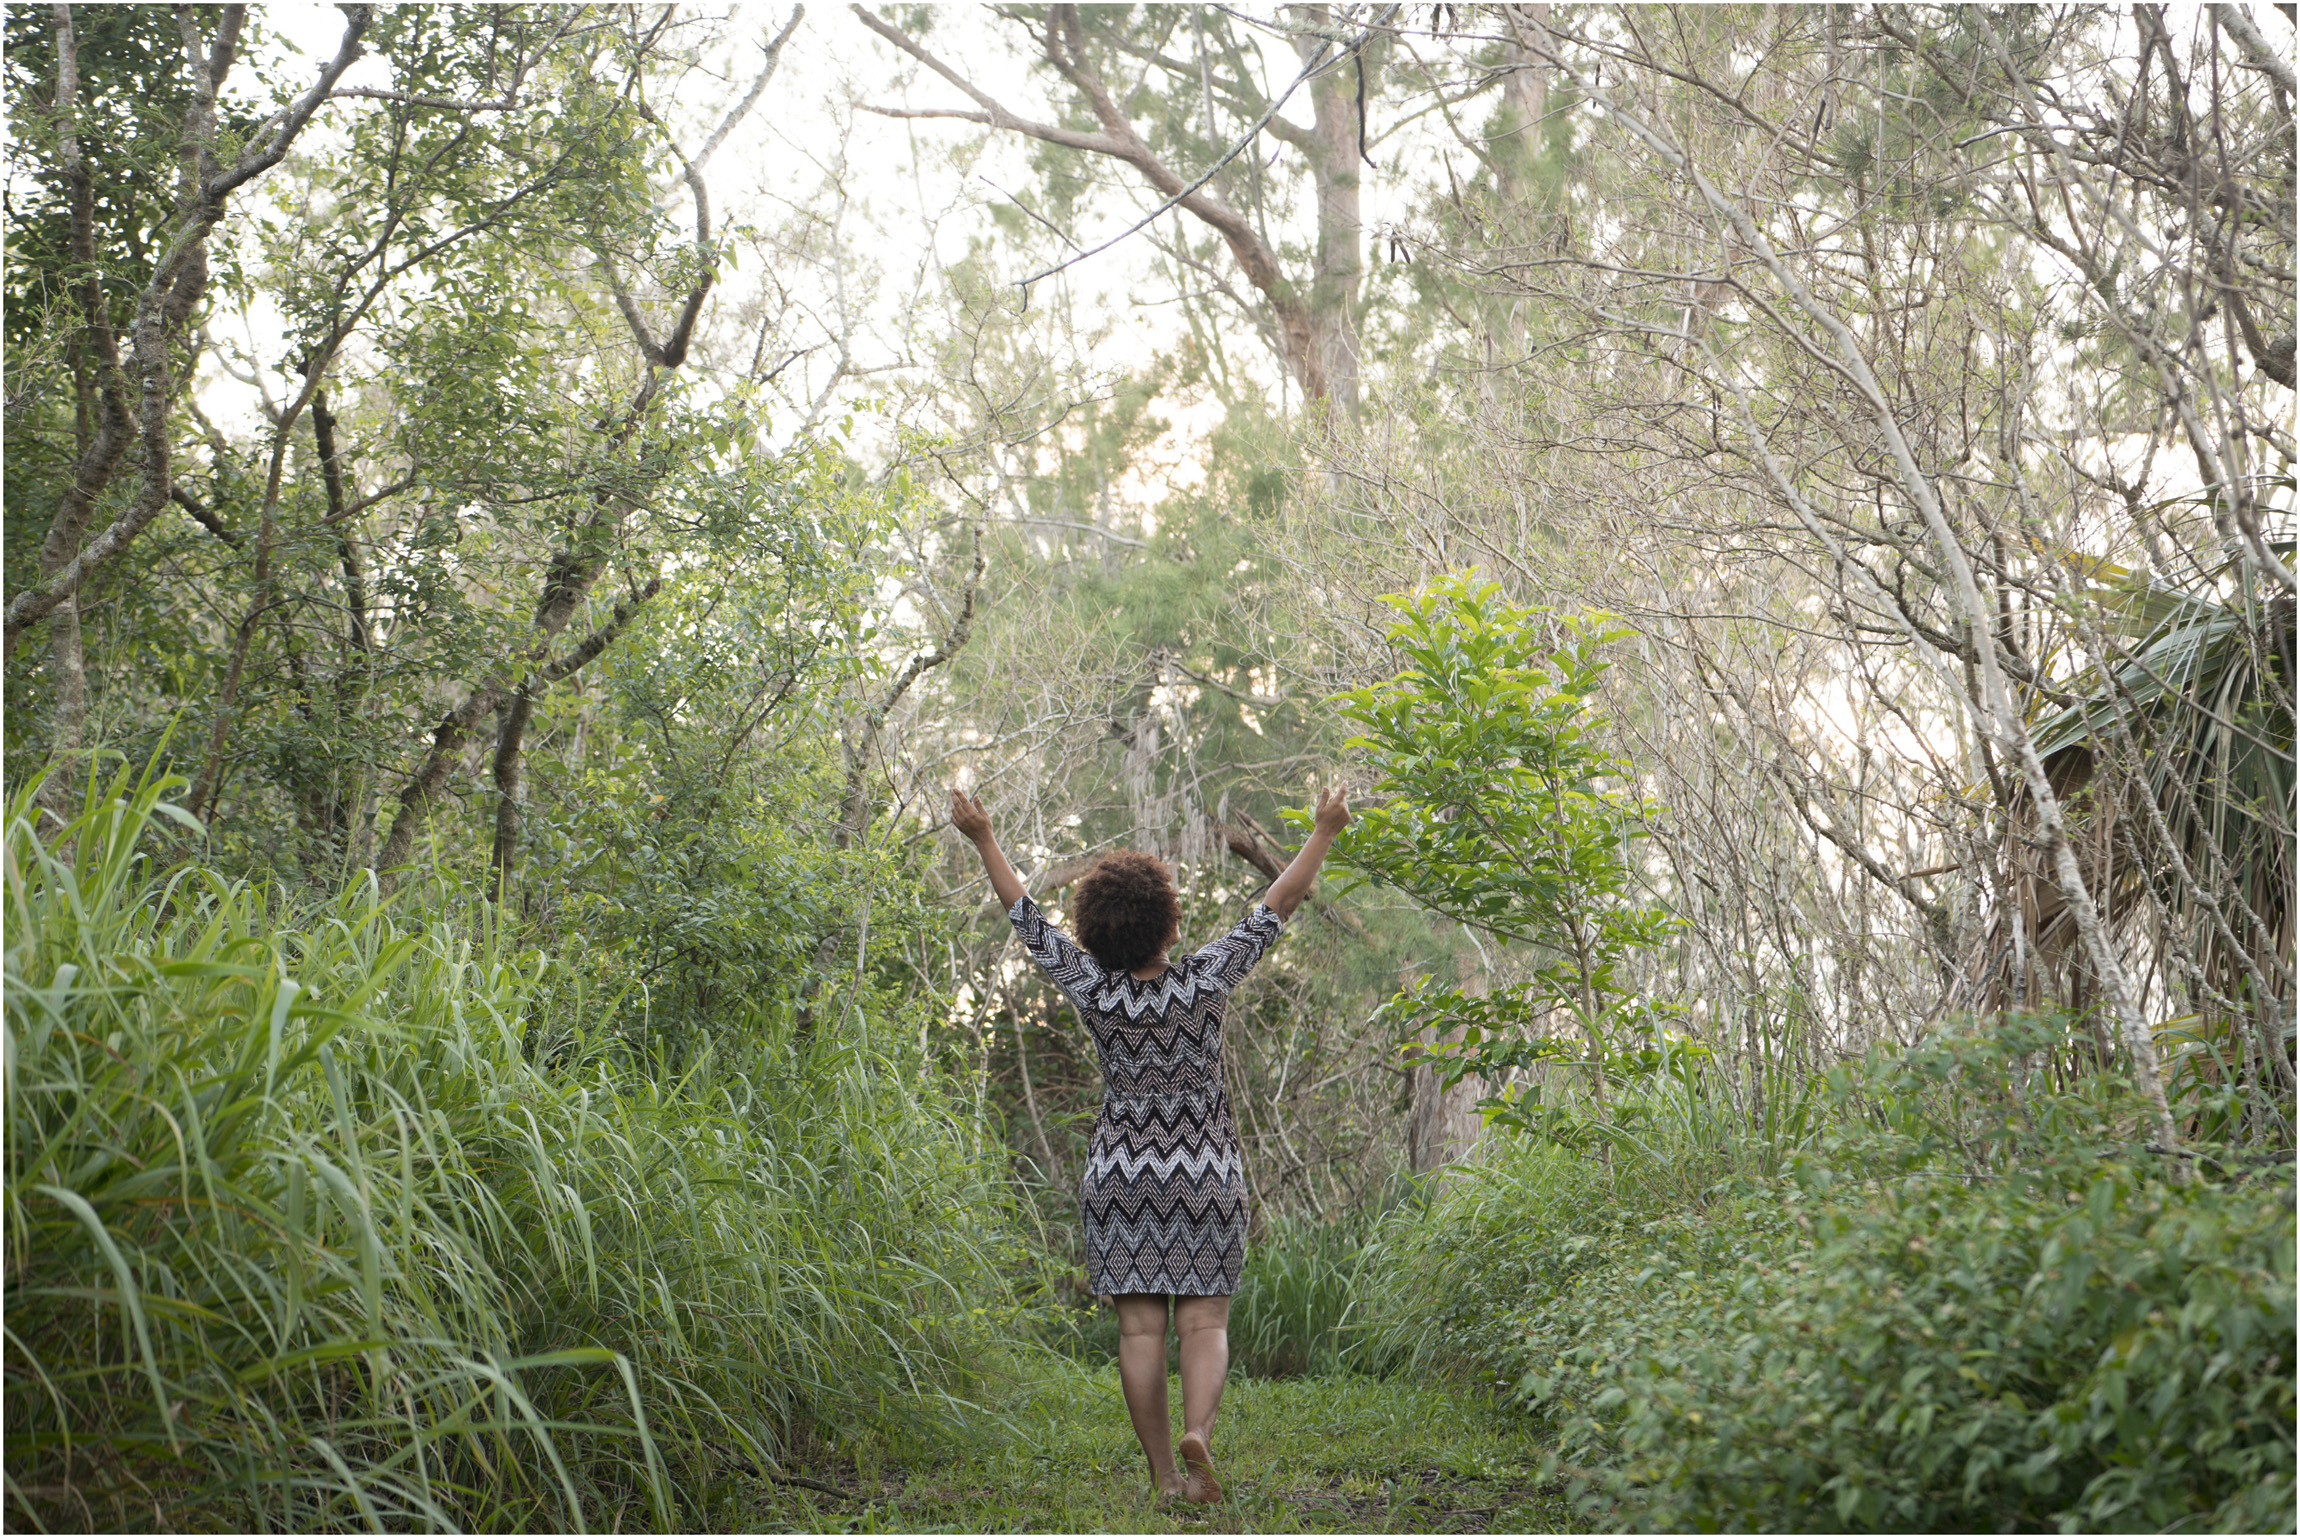 ©FianderFoto_Winnow_Five Senses Wild Edible Herbal Tour_003.jpg